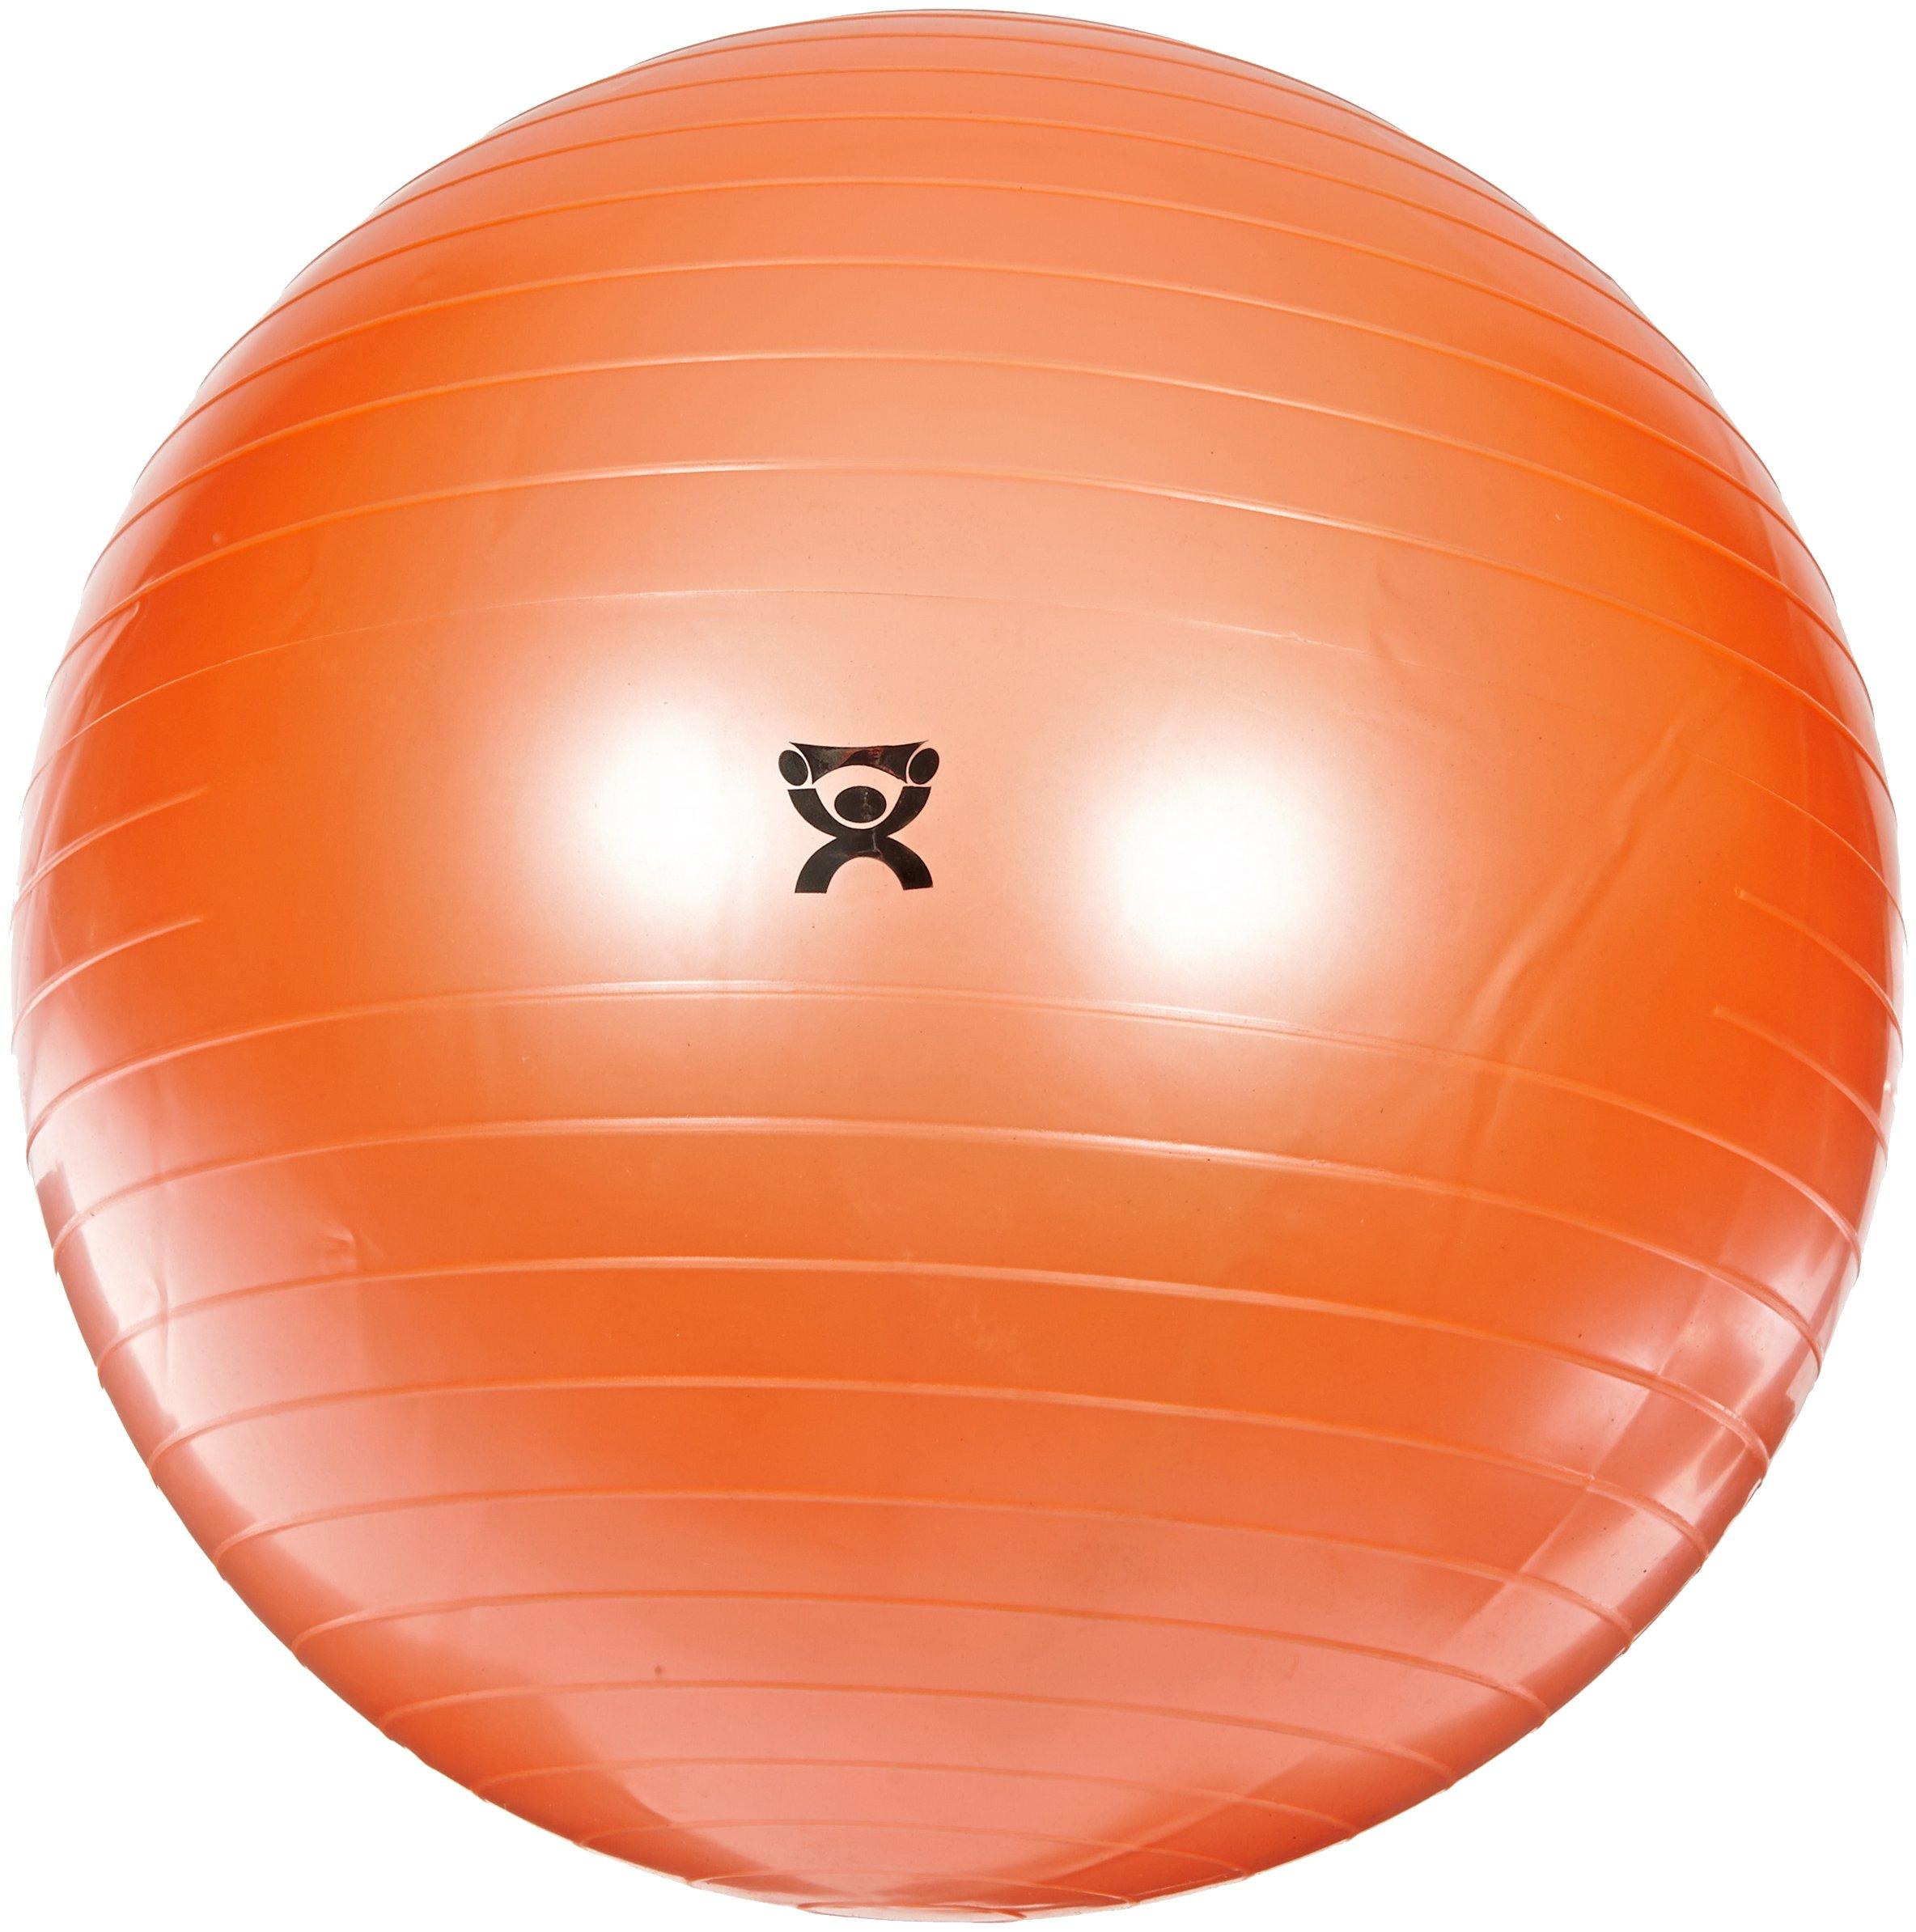 Cando 30-1802 Orange Non-Slip PVC Vinyl Inflatable Exercise Ball, 22'' Diameter, 300 lbs Weight Capacity by Cando